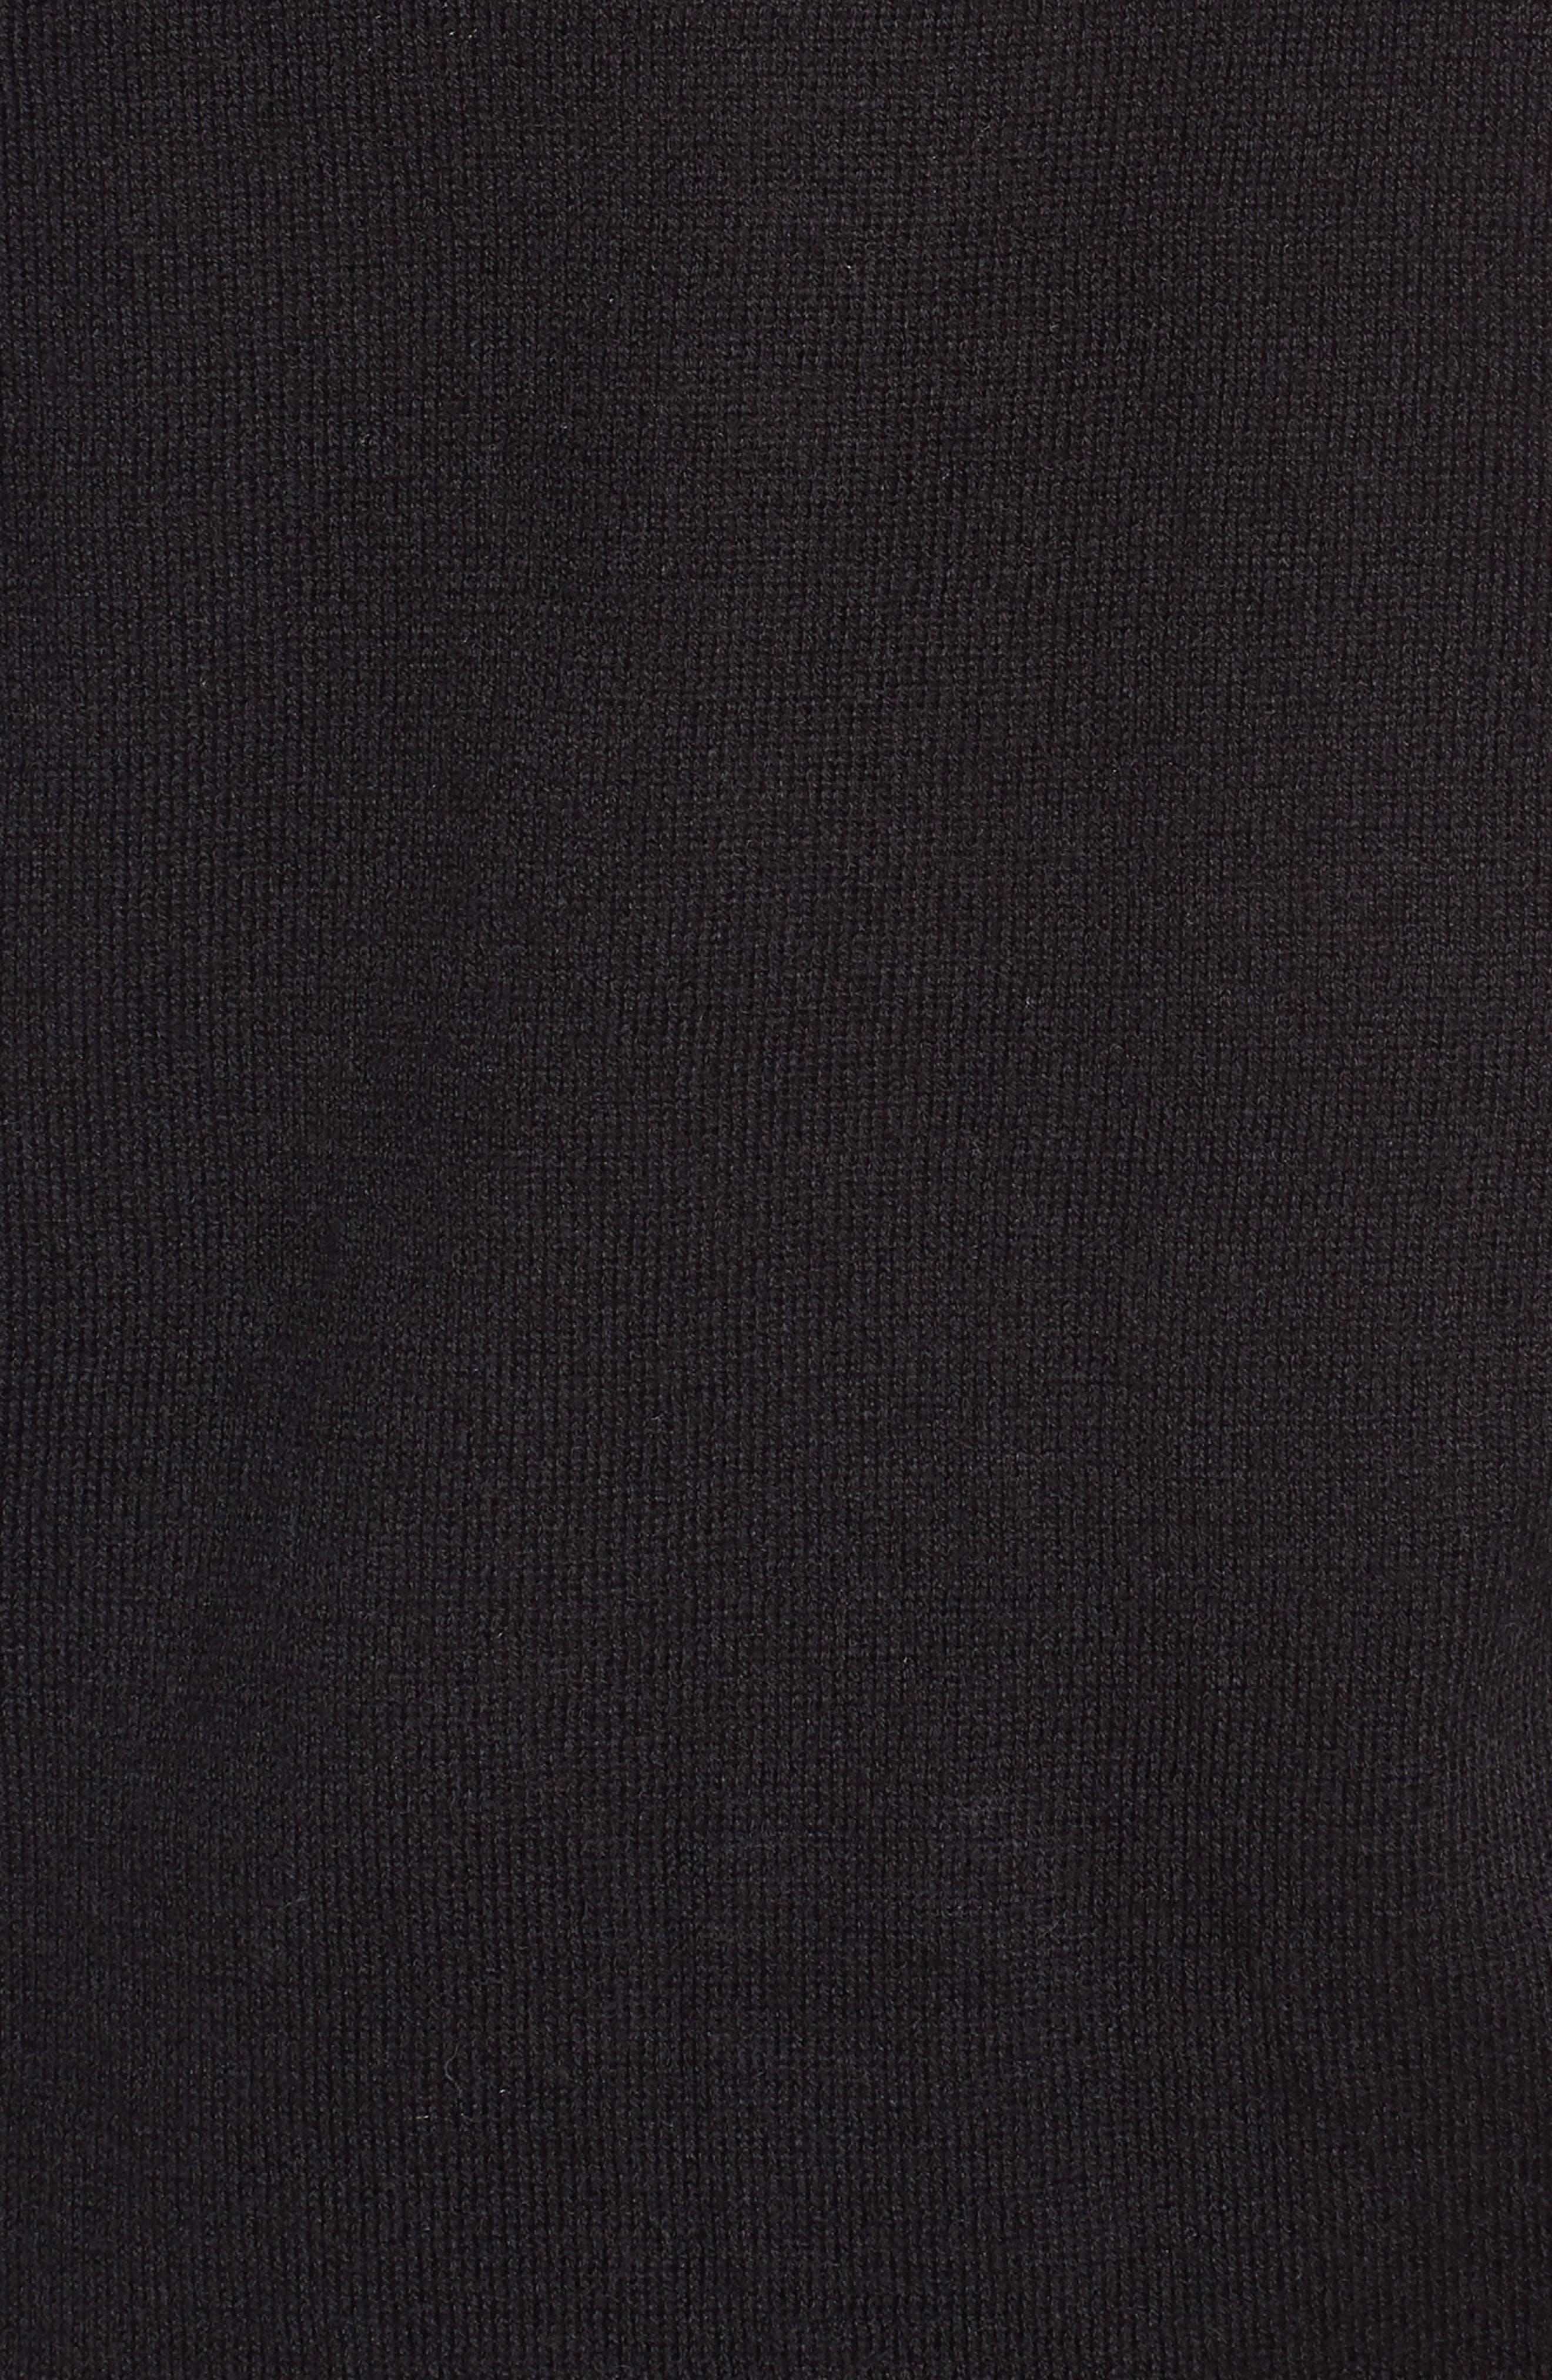 Convertible Bateau Neck Sweater,                             Alternate thumbnail 13, color,